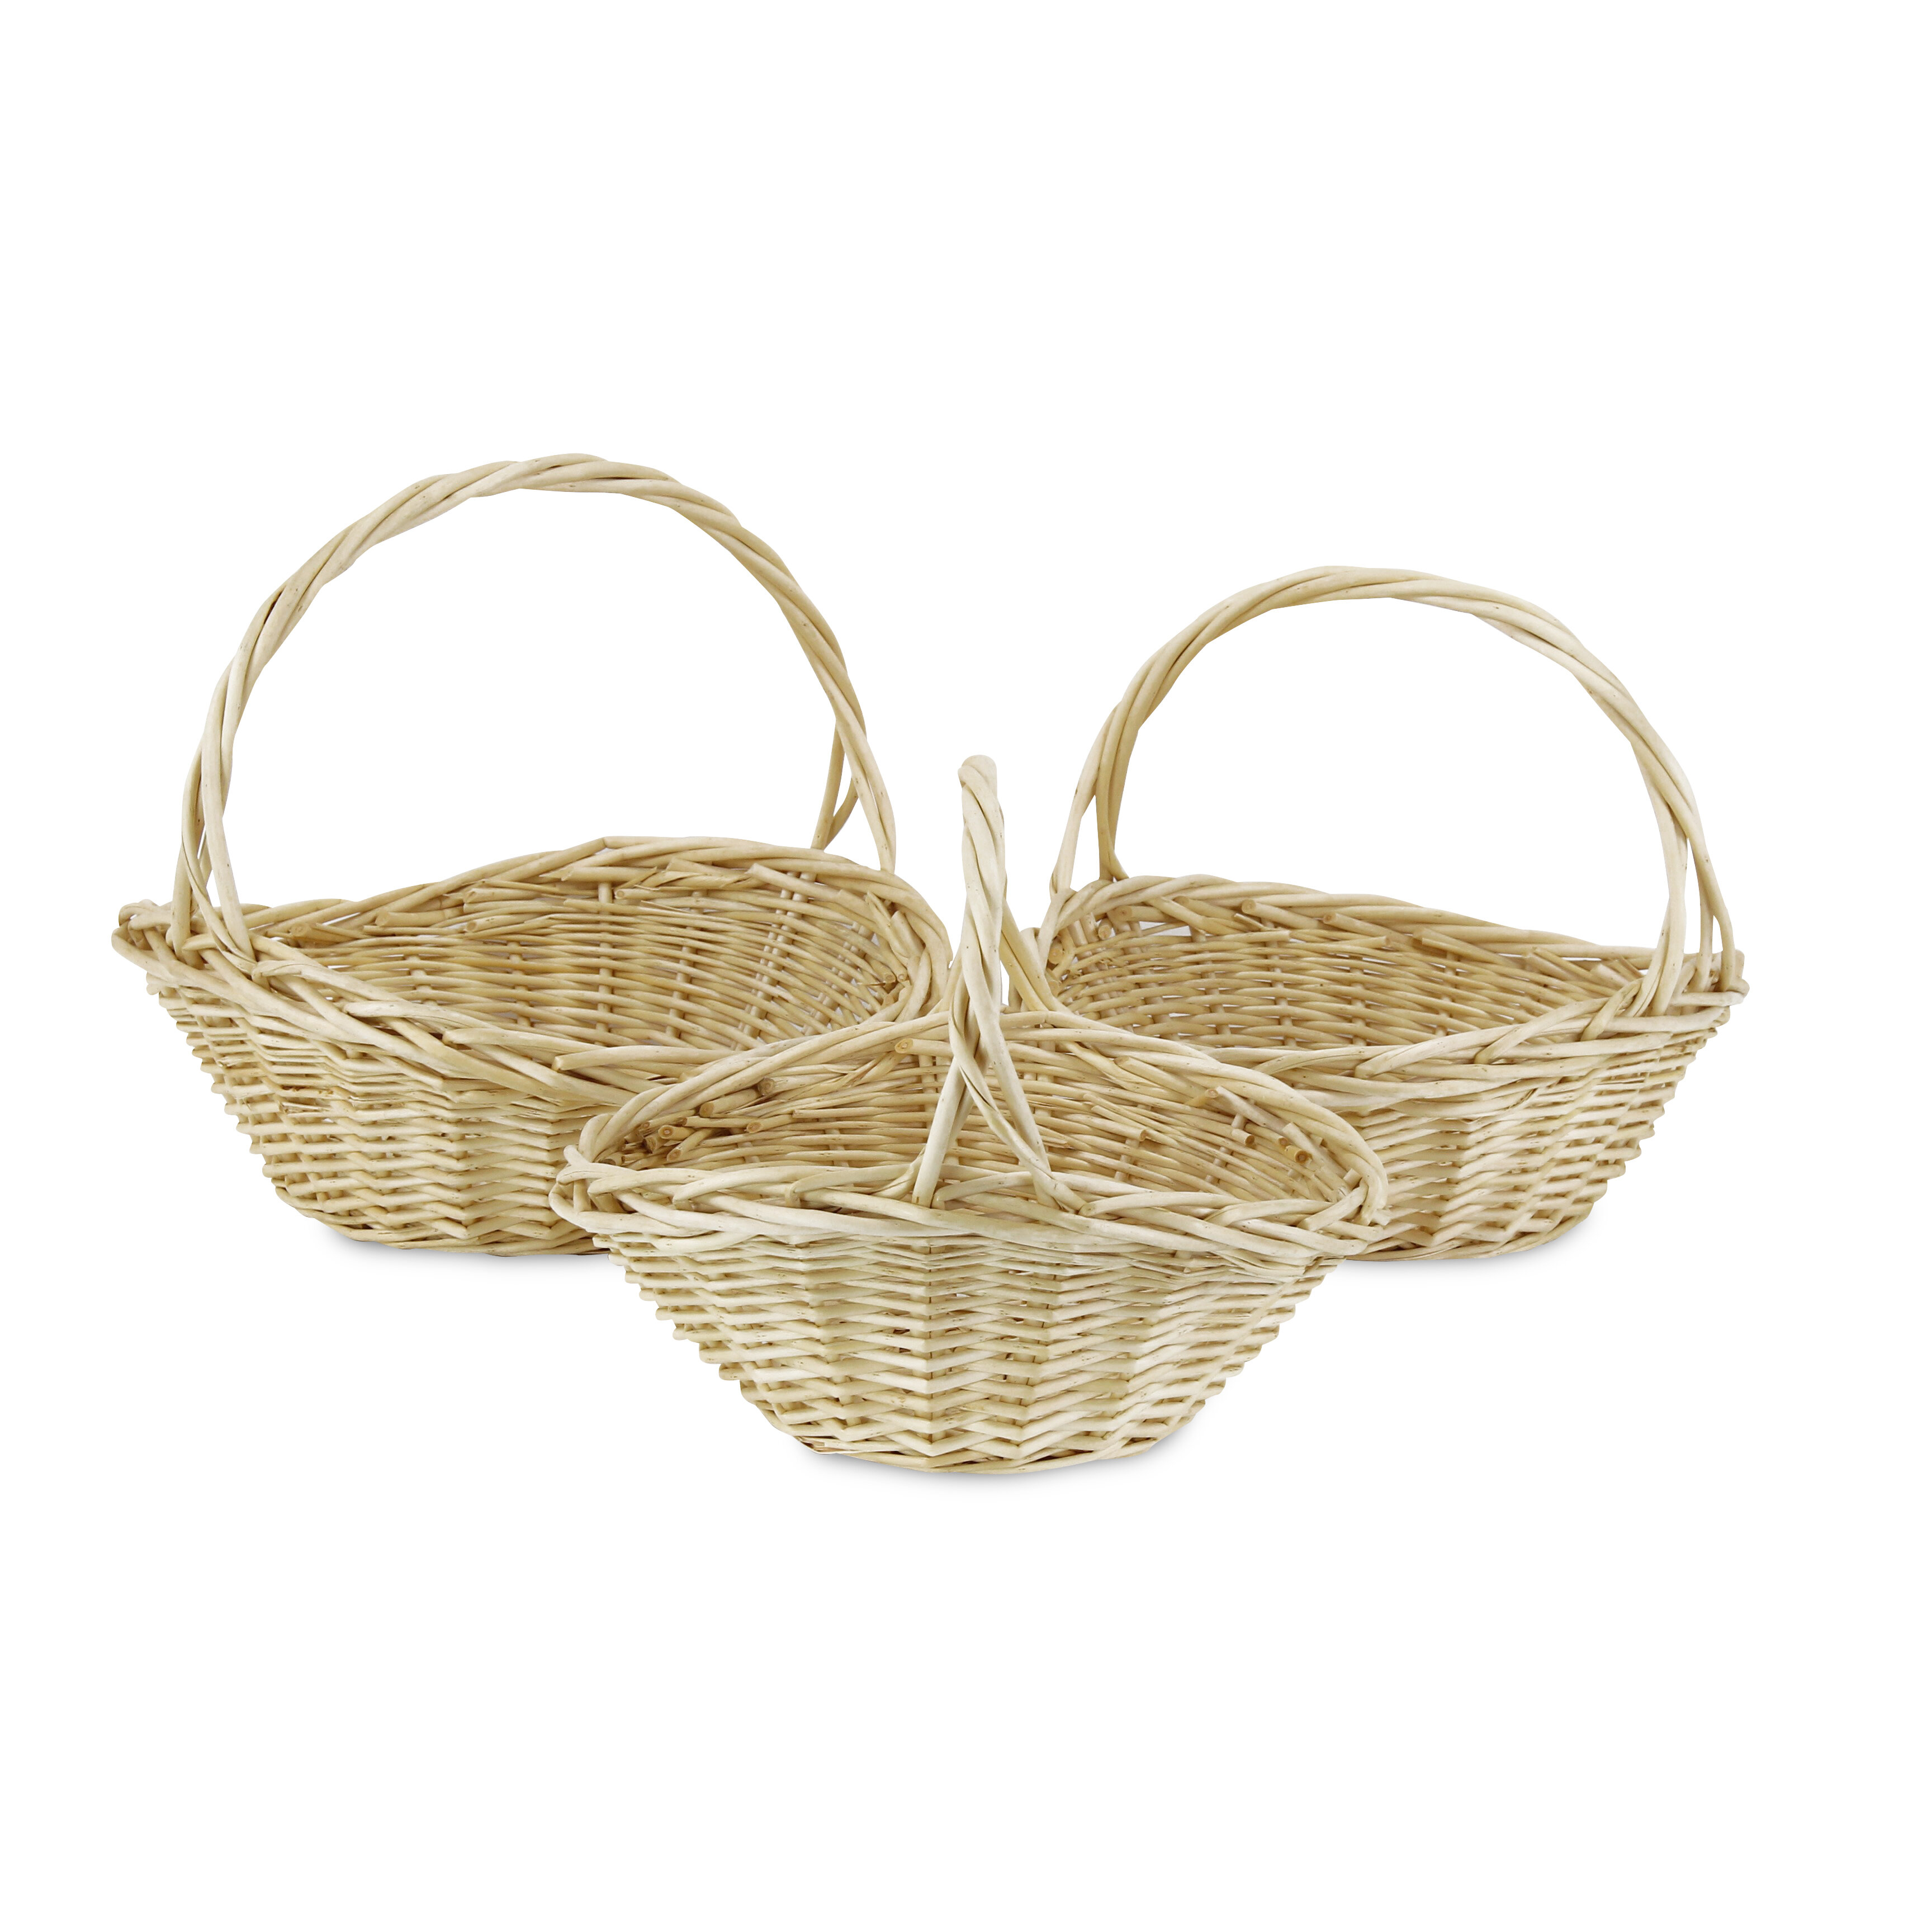 Dovecove Fireside 3 Piece Wicker Rattan Basket Set Wayfair